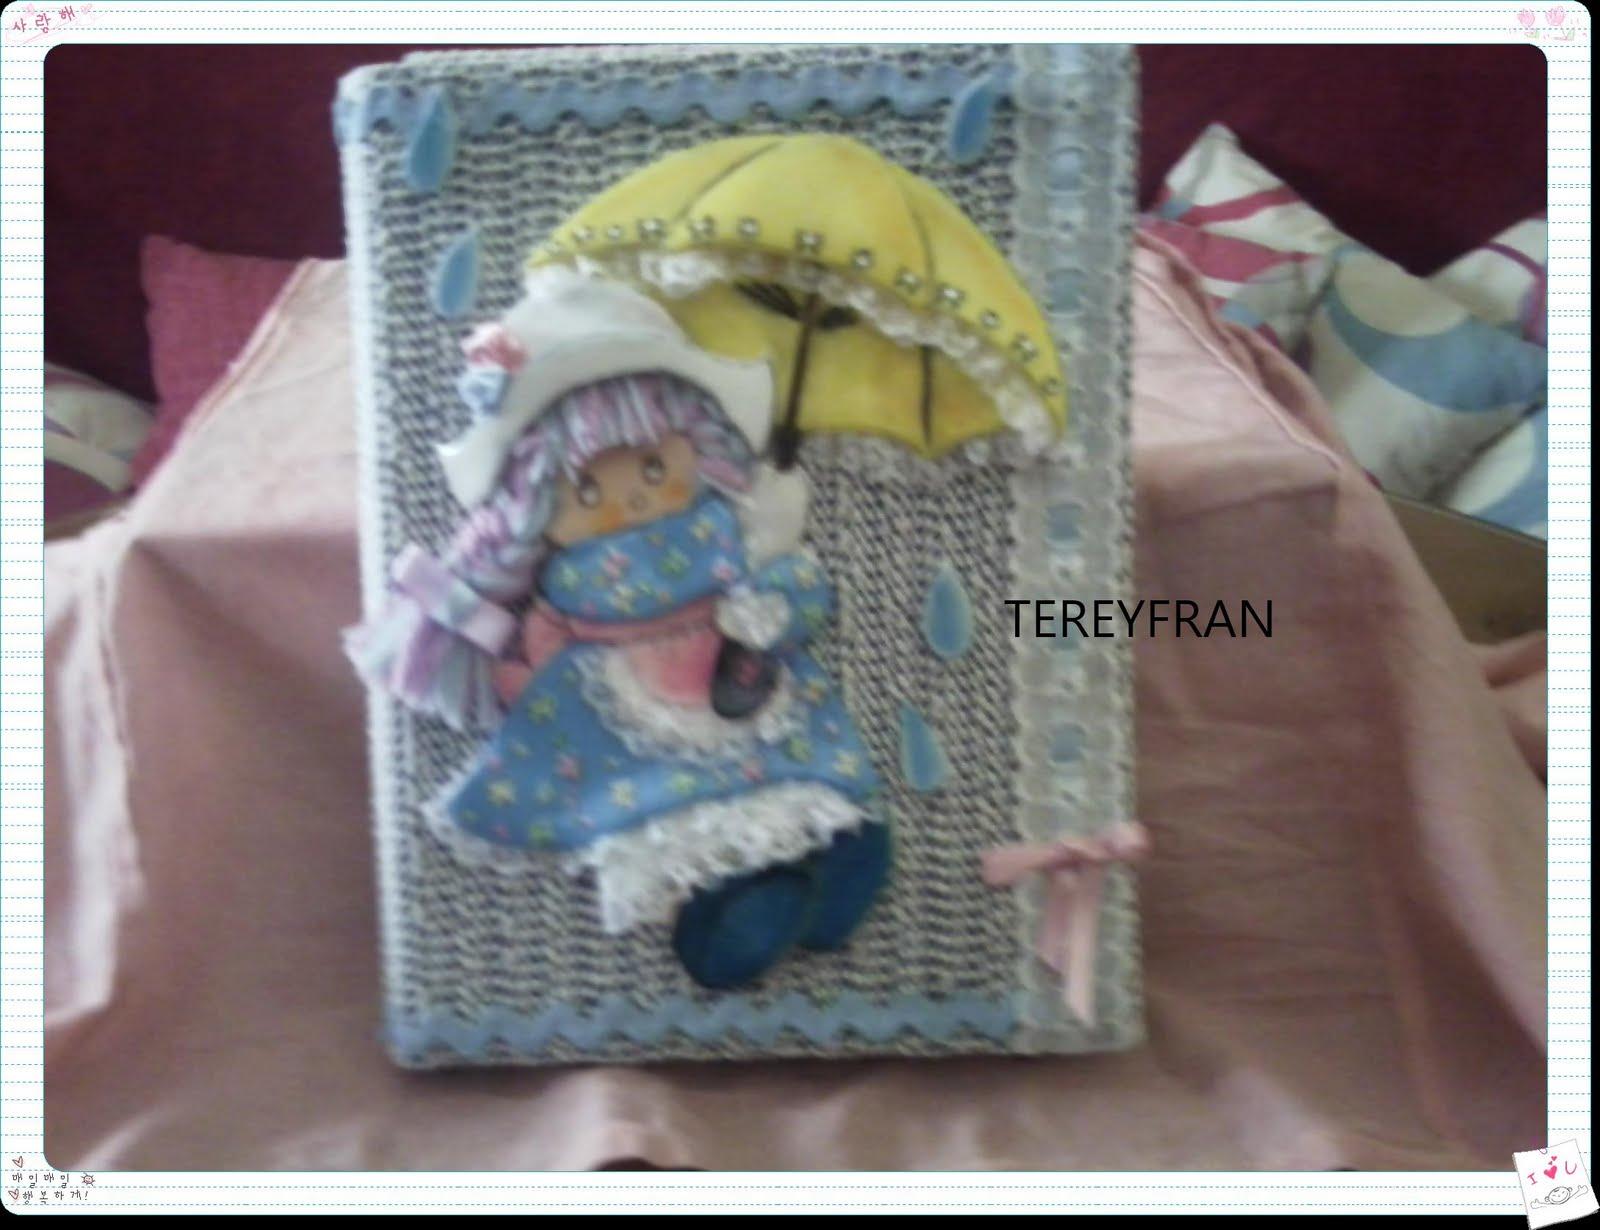 una carpeta maravillosa de goma eva tengo una muñeca vestida de azul